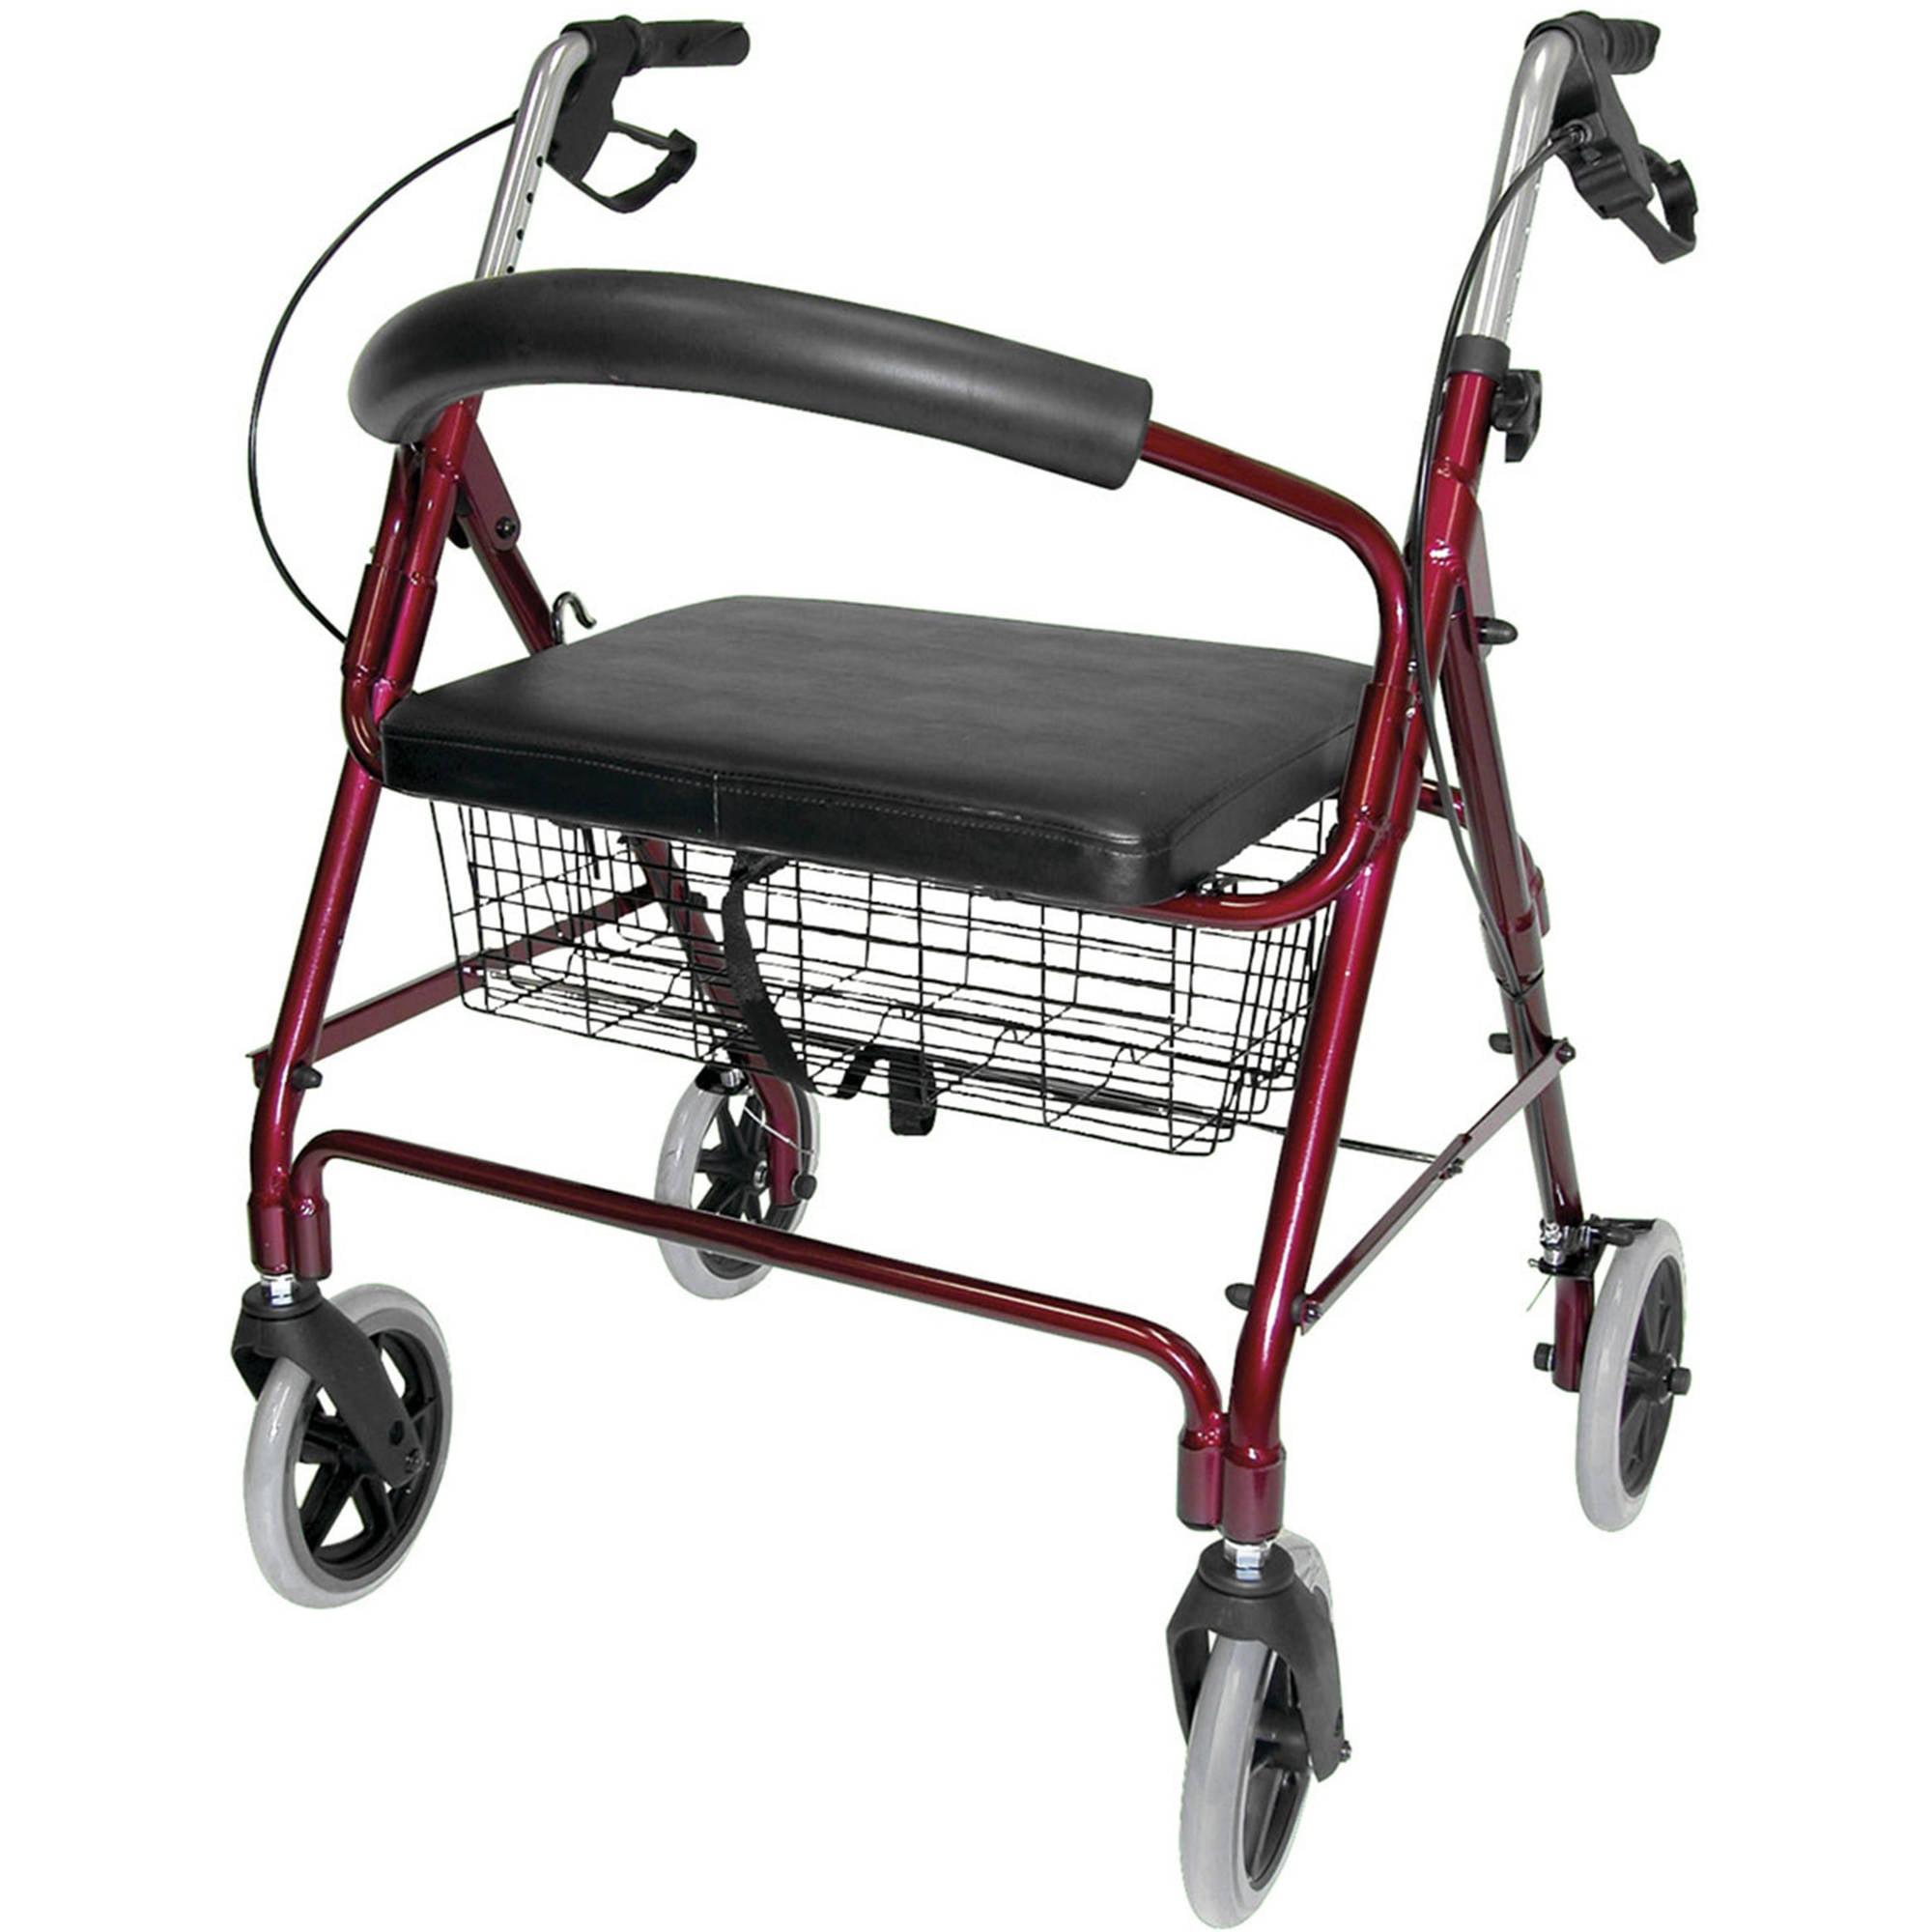 DMI Lightweight Extra-wide Aluminum Rollator Walker with Seat, Burgundy, Folding